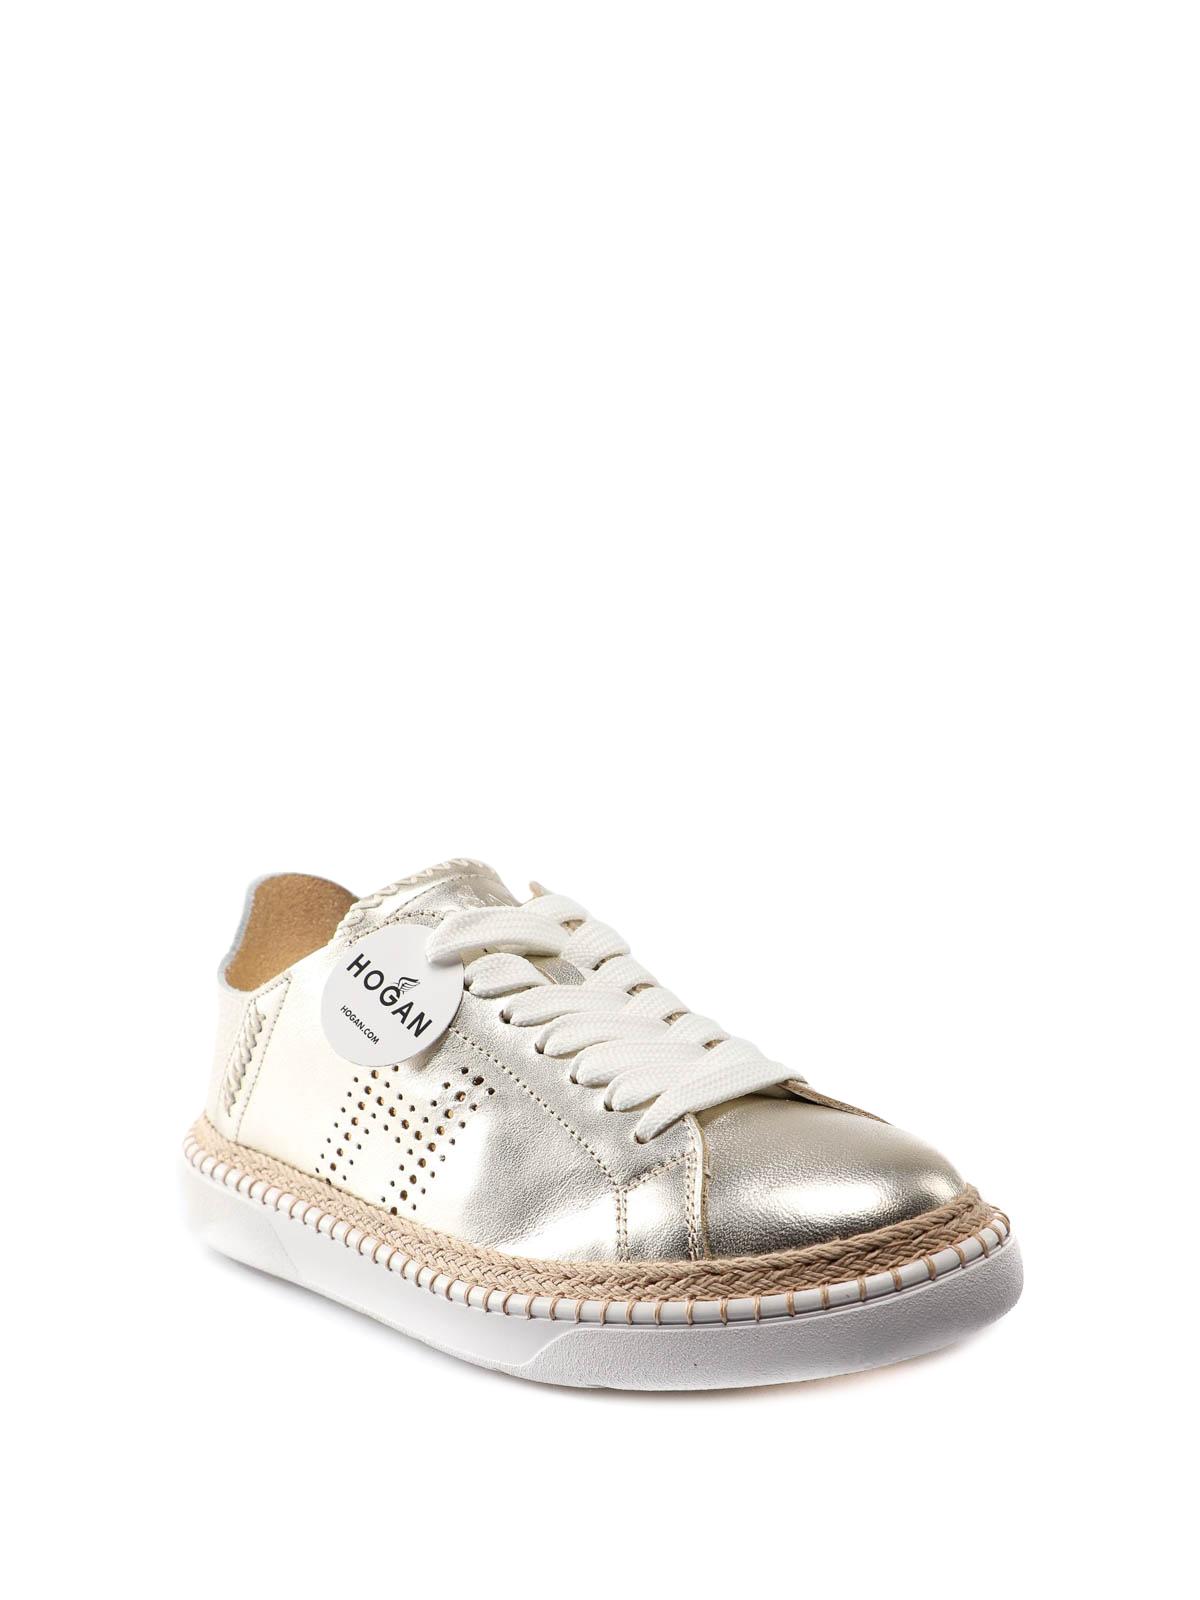 Hogan - H327 platinum leather sneakers - trainers - HXW4200BM60KO00QEF